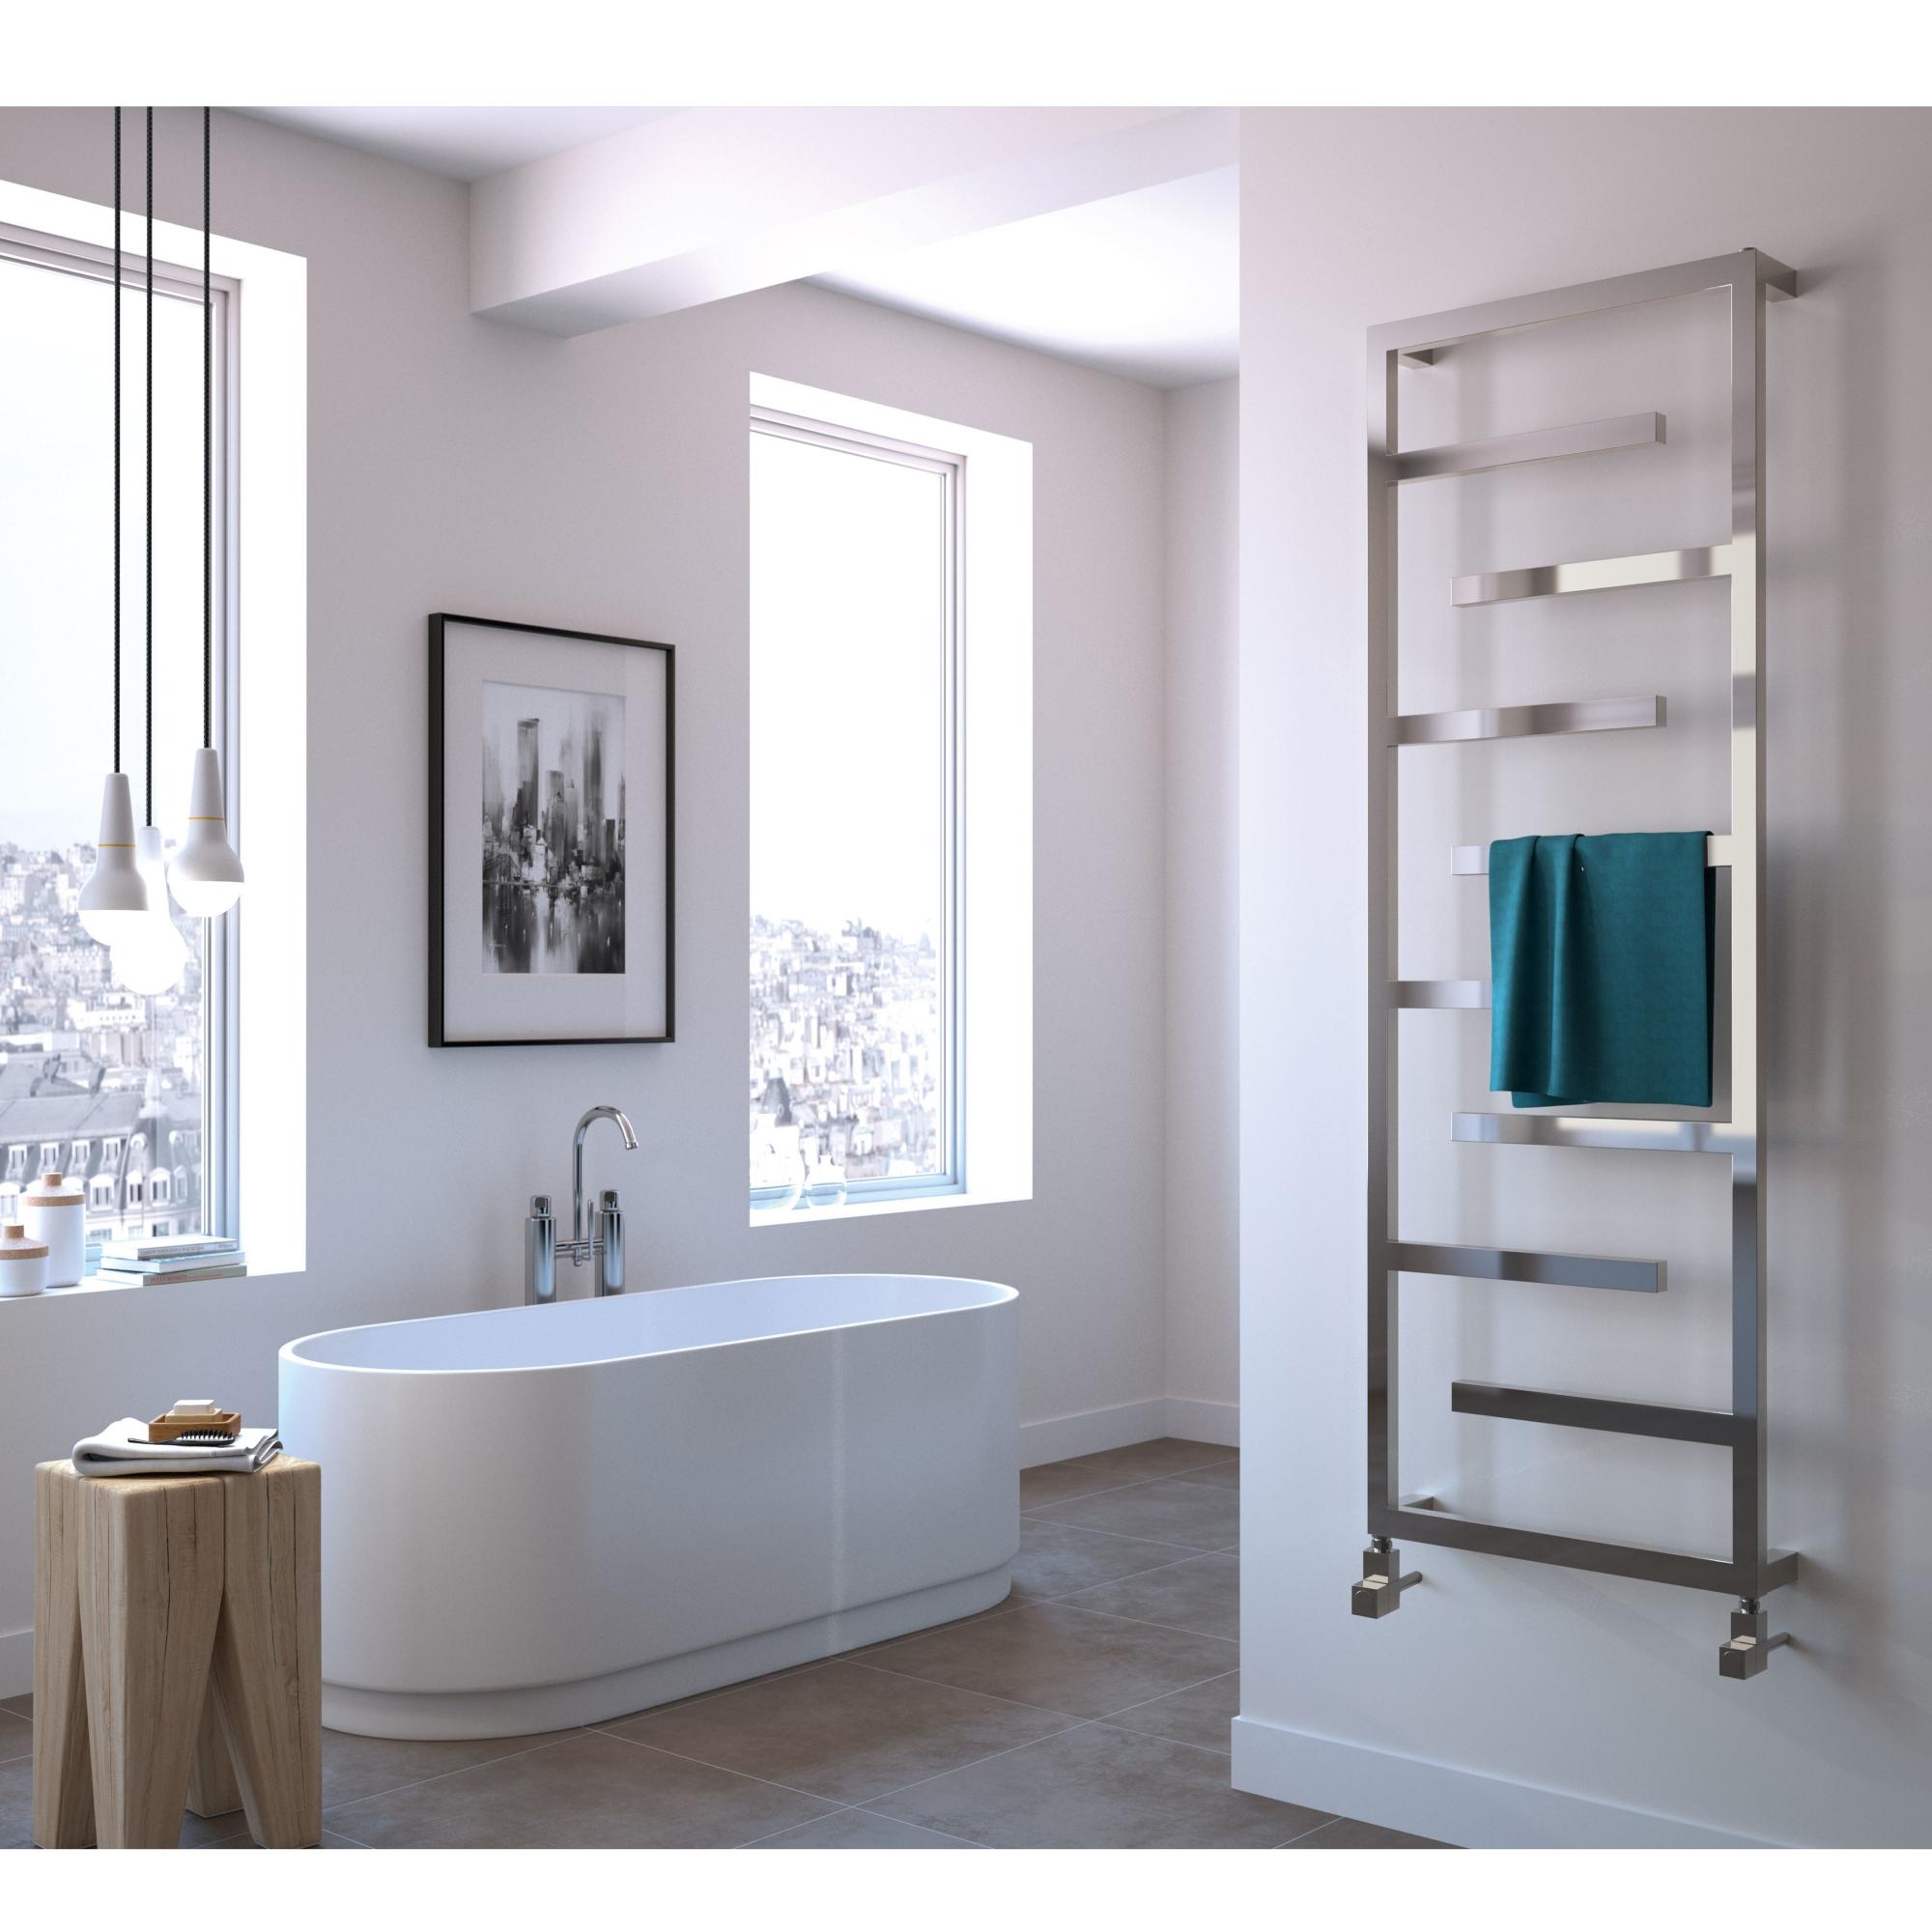 Radox Aztec Designer Heated Towel Rail 1615mm H x 600mm W Chrome-0